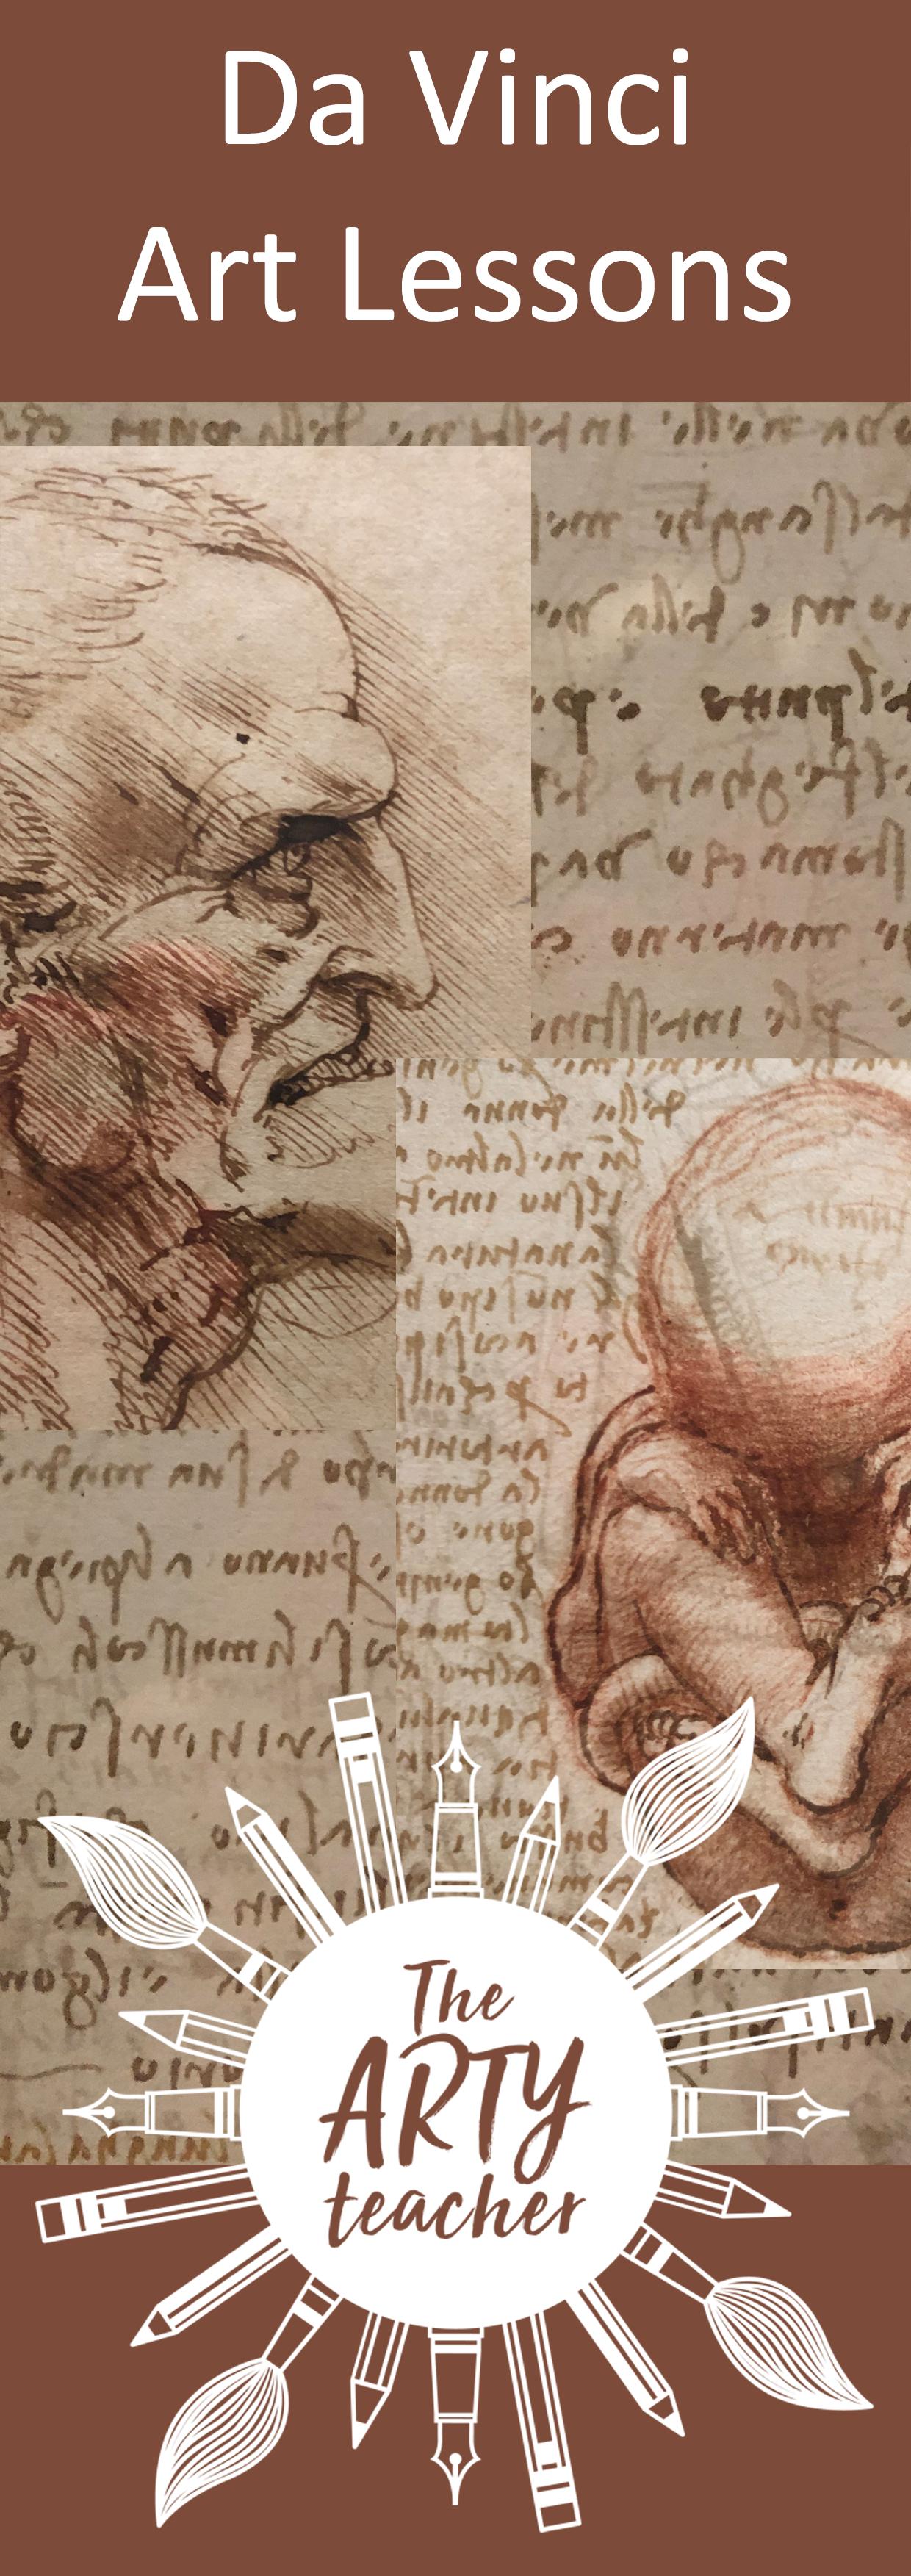 Leonardo Da Vinci art resources for Art Teachers . Art